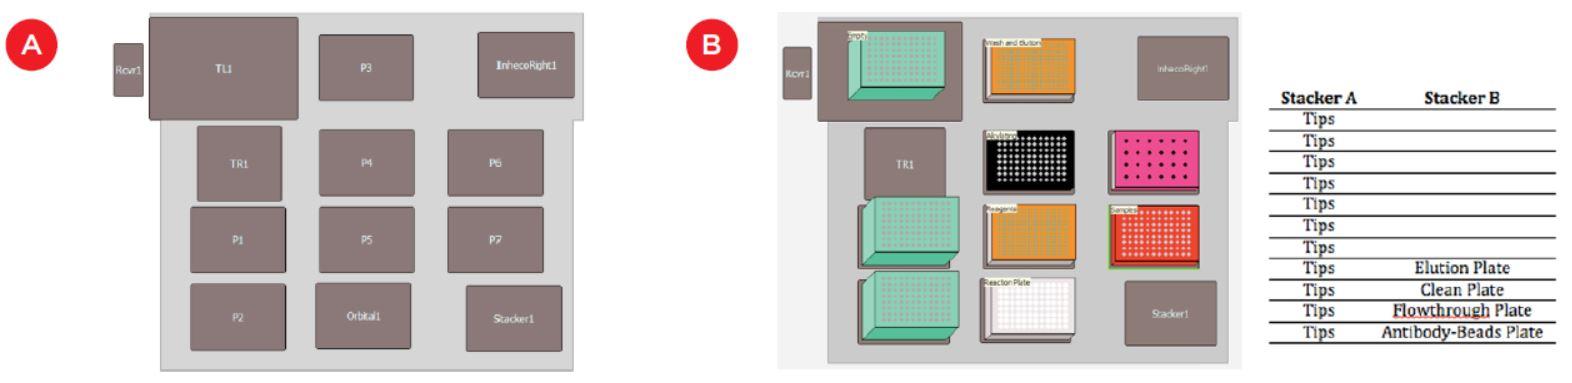 Automatización Nota de aplicación SISCAPA Disposición de la plataforma y configuración Figura 3